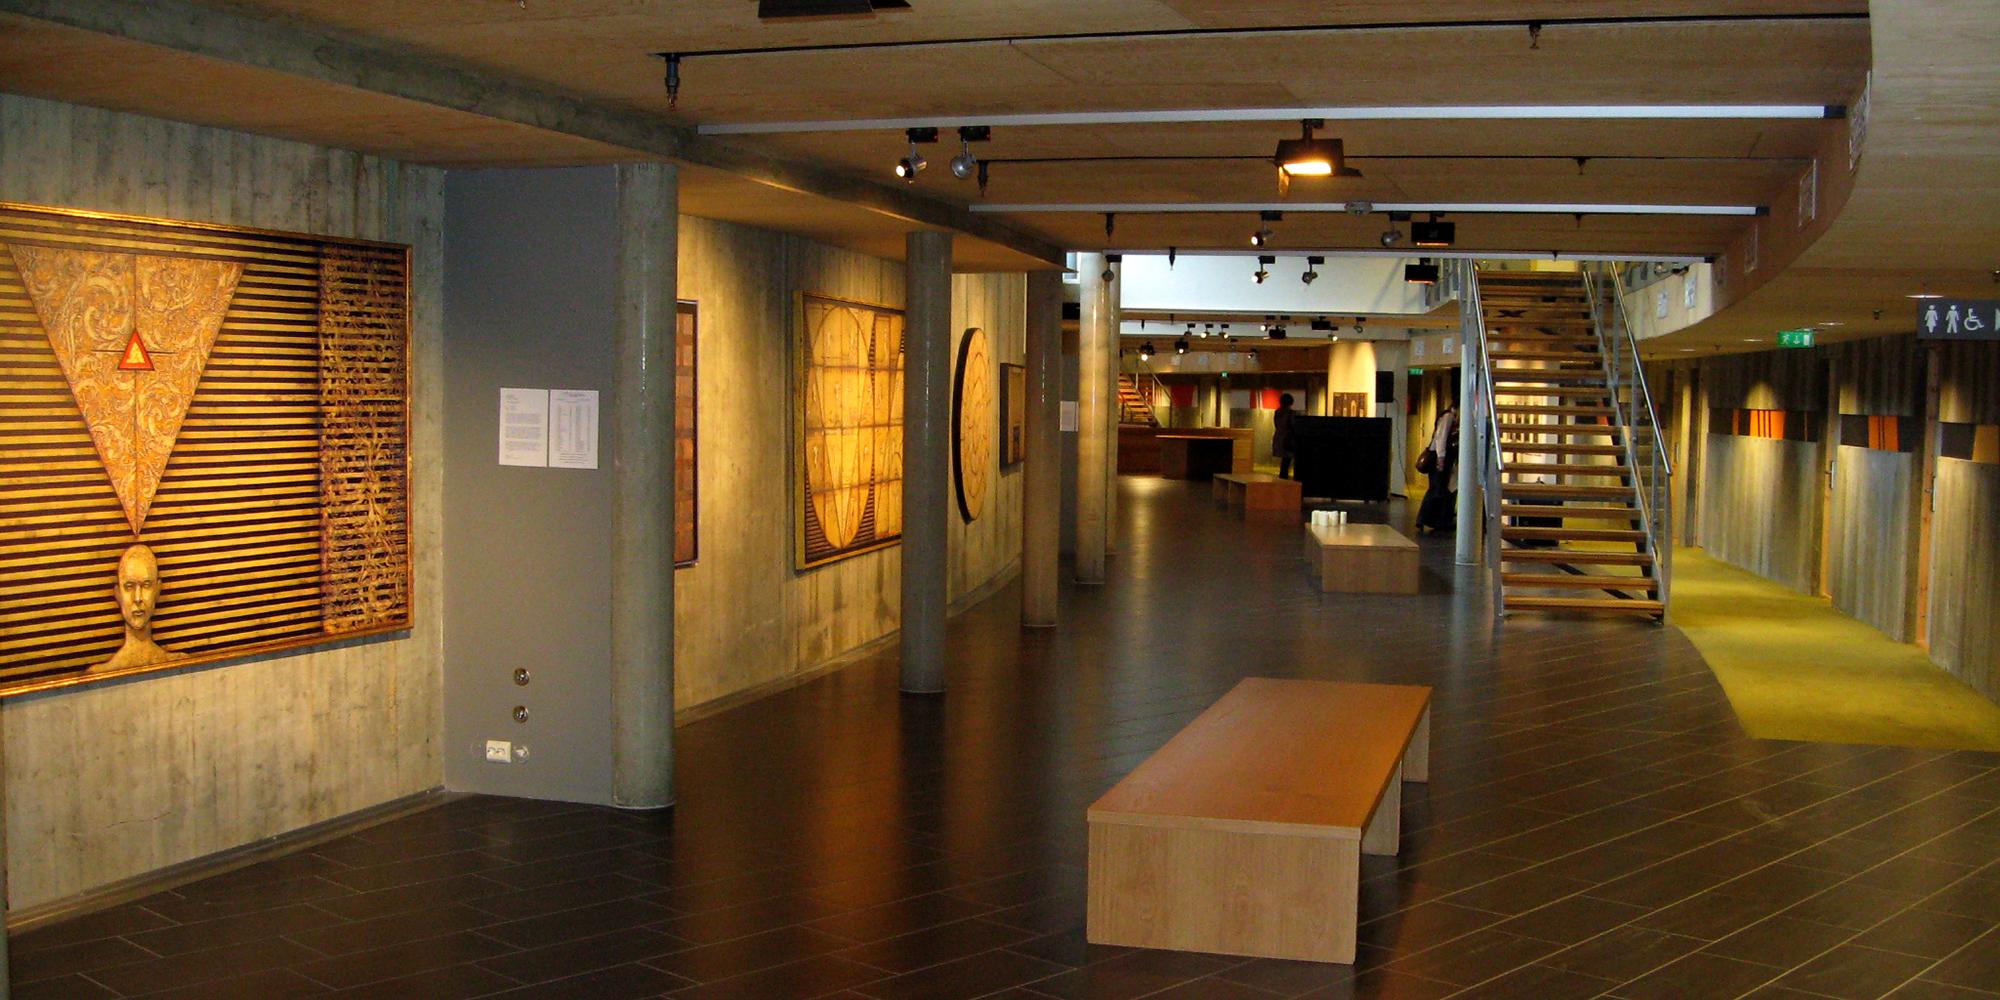 Stiklestad Hotell - gallery Leidangen. Copyright: Stiklestad Hotell